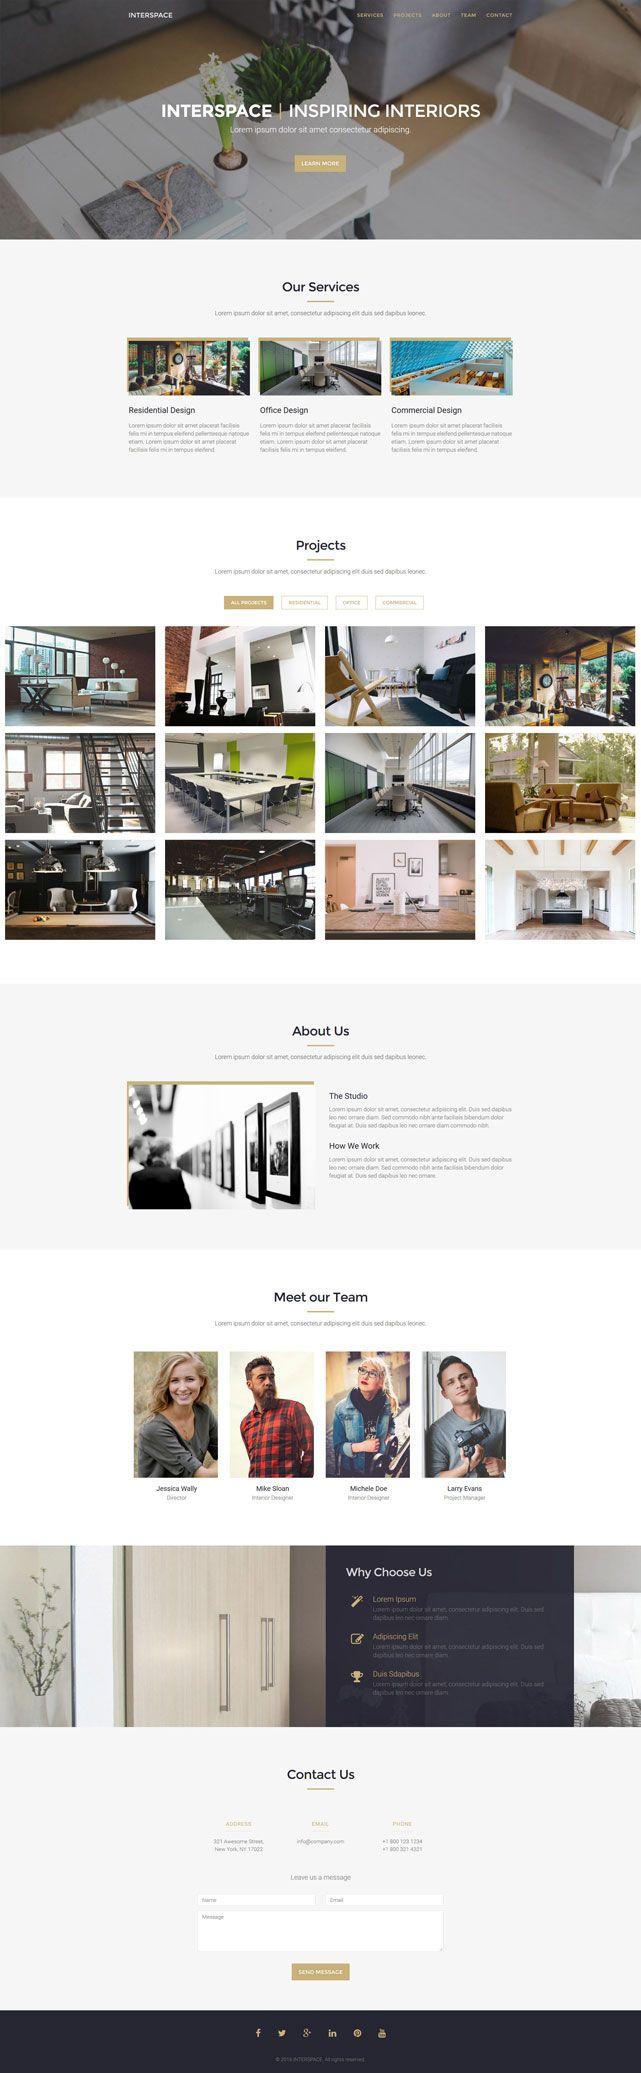 Interspace - Interior Design HTML Website Template